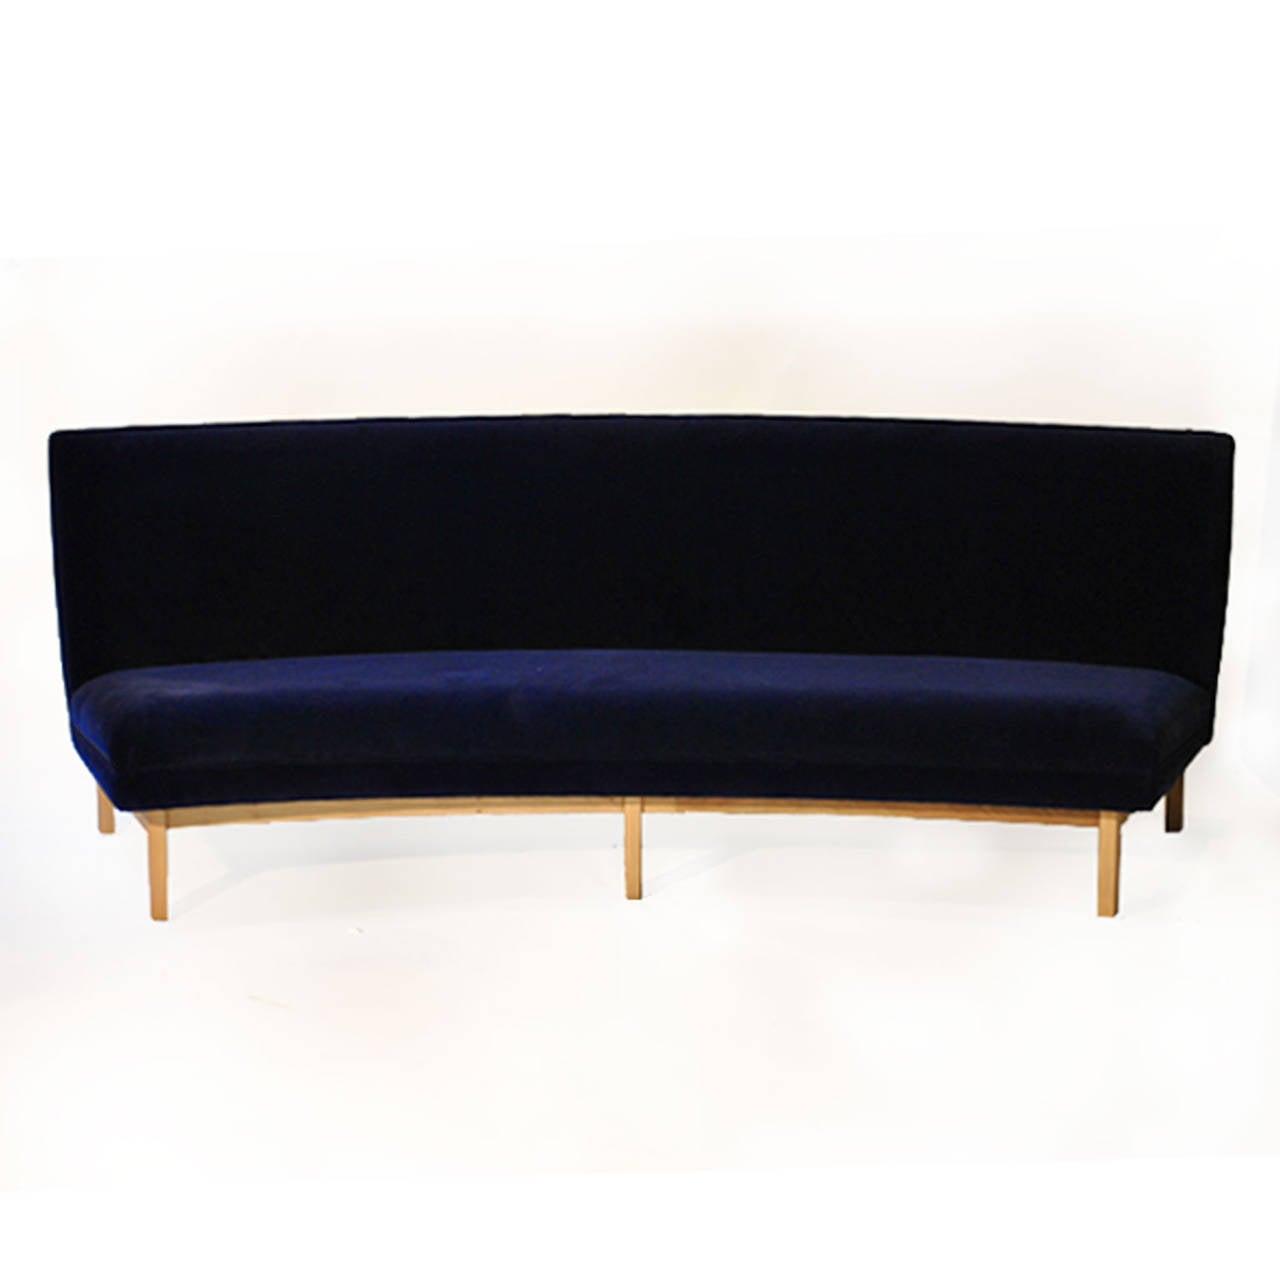 dux sofa by folke ohlsson indian modern design four-seat semicircular sofa. at 1stdibs